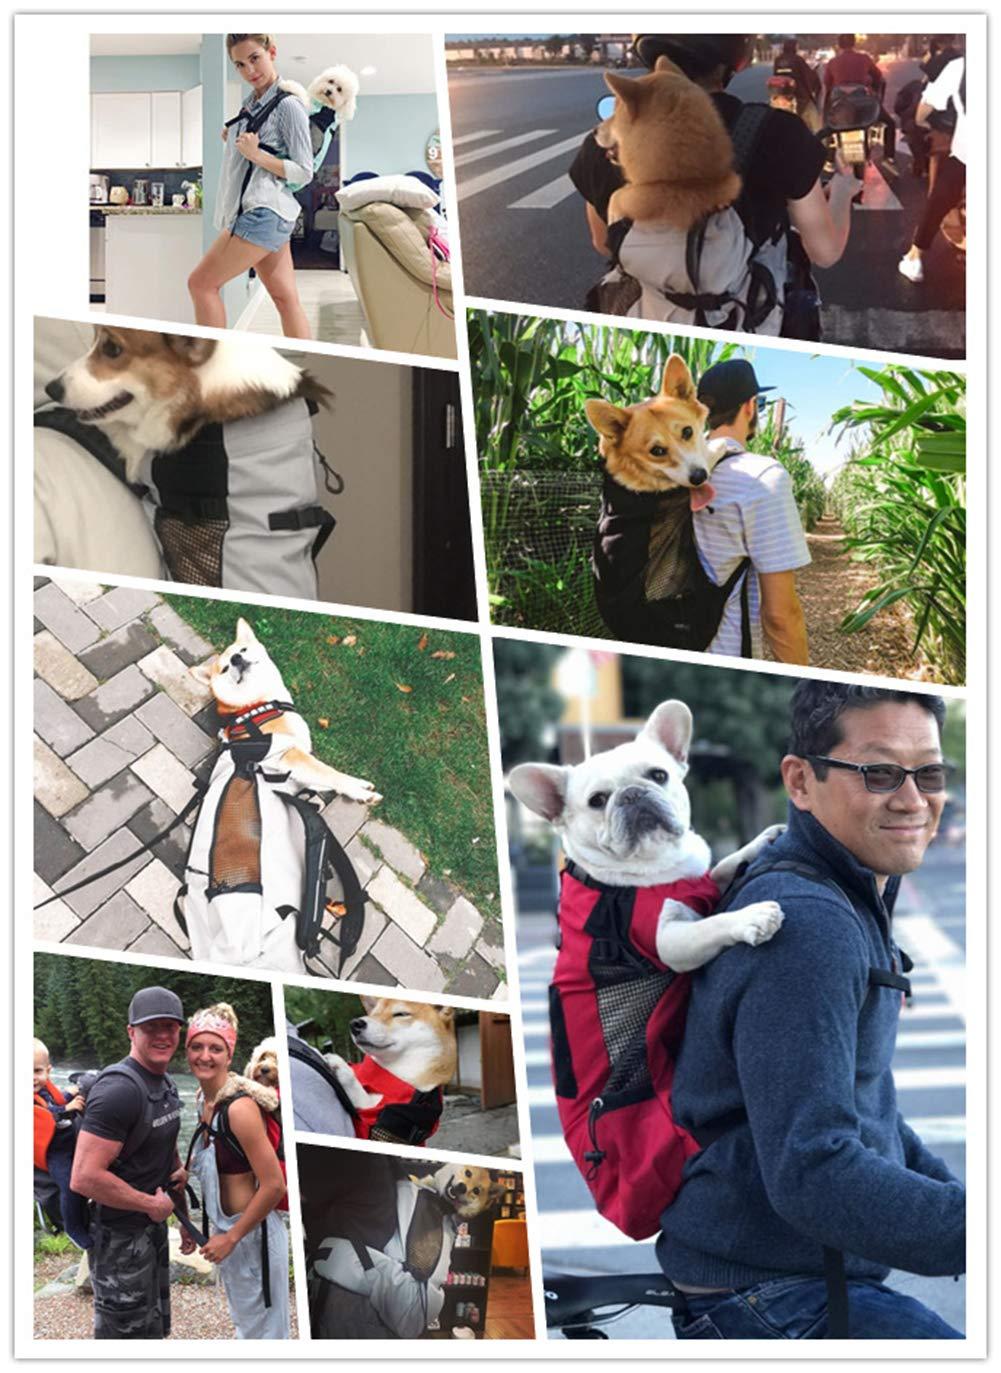 Mochila para Mascotas Perros Portabeb/és Compras Negro L LNFA Mochila de Transporte para Perros y Gatos Senderismo Bolsa de Transporte para Mascotas